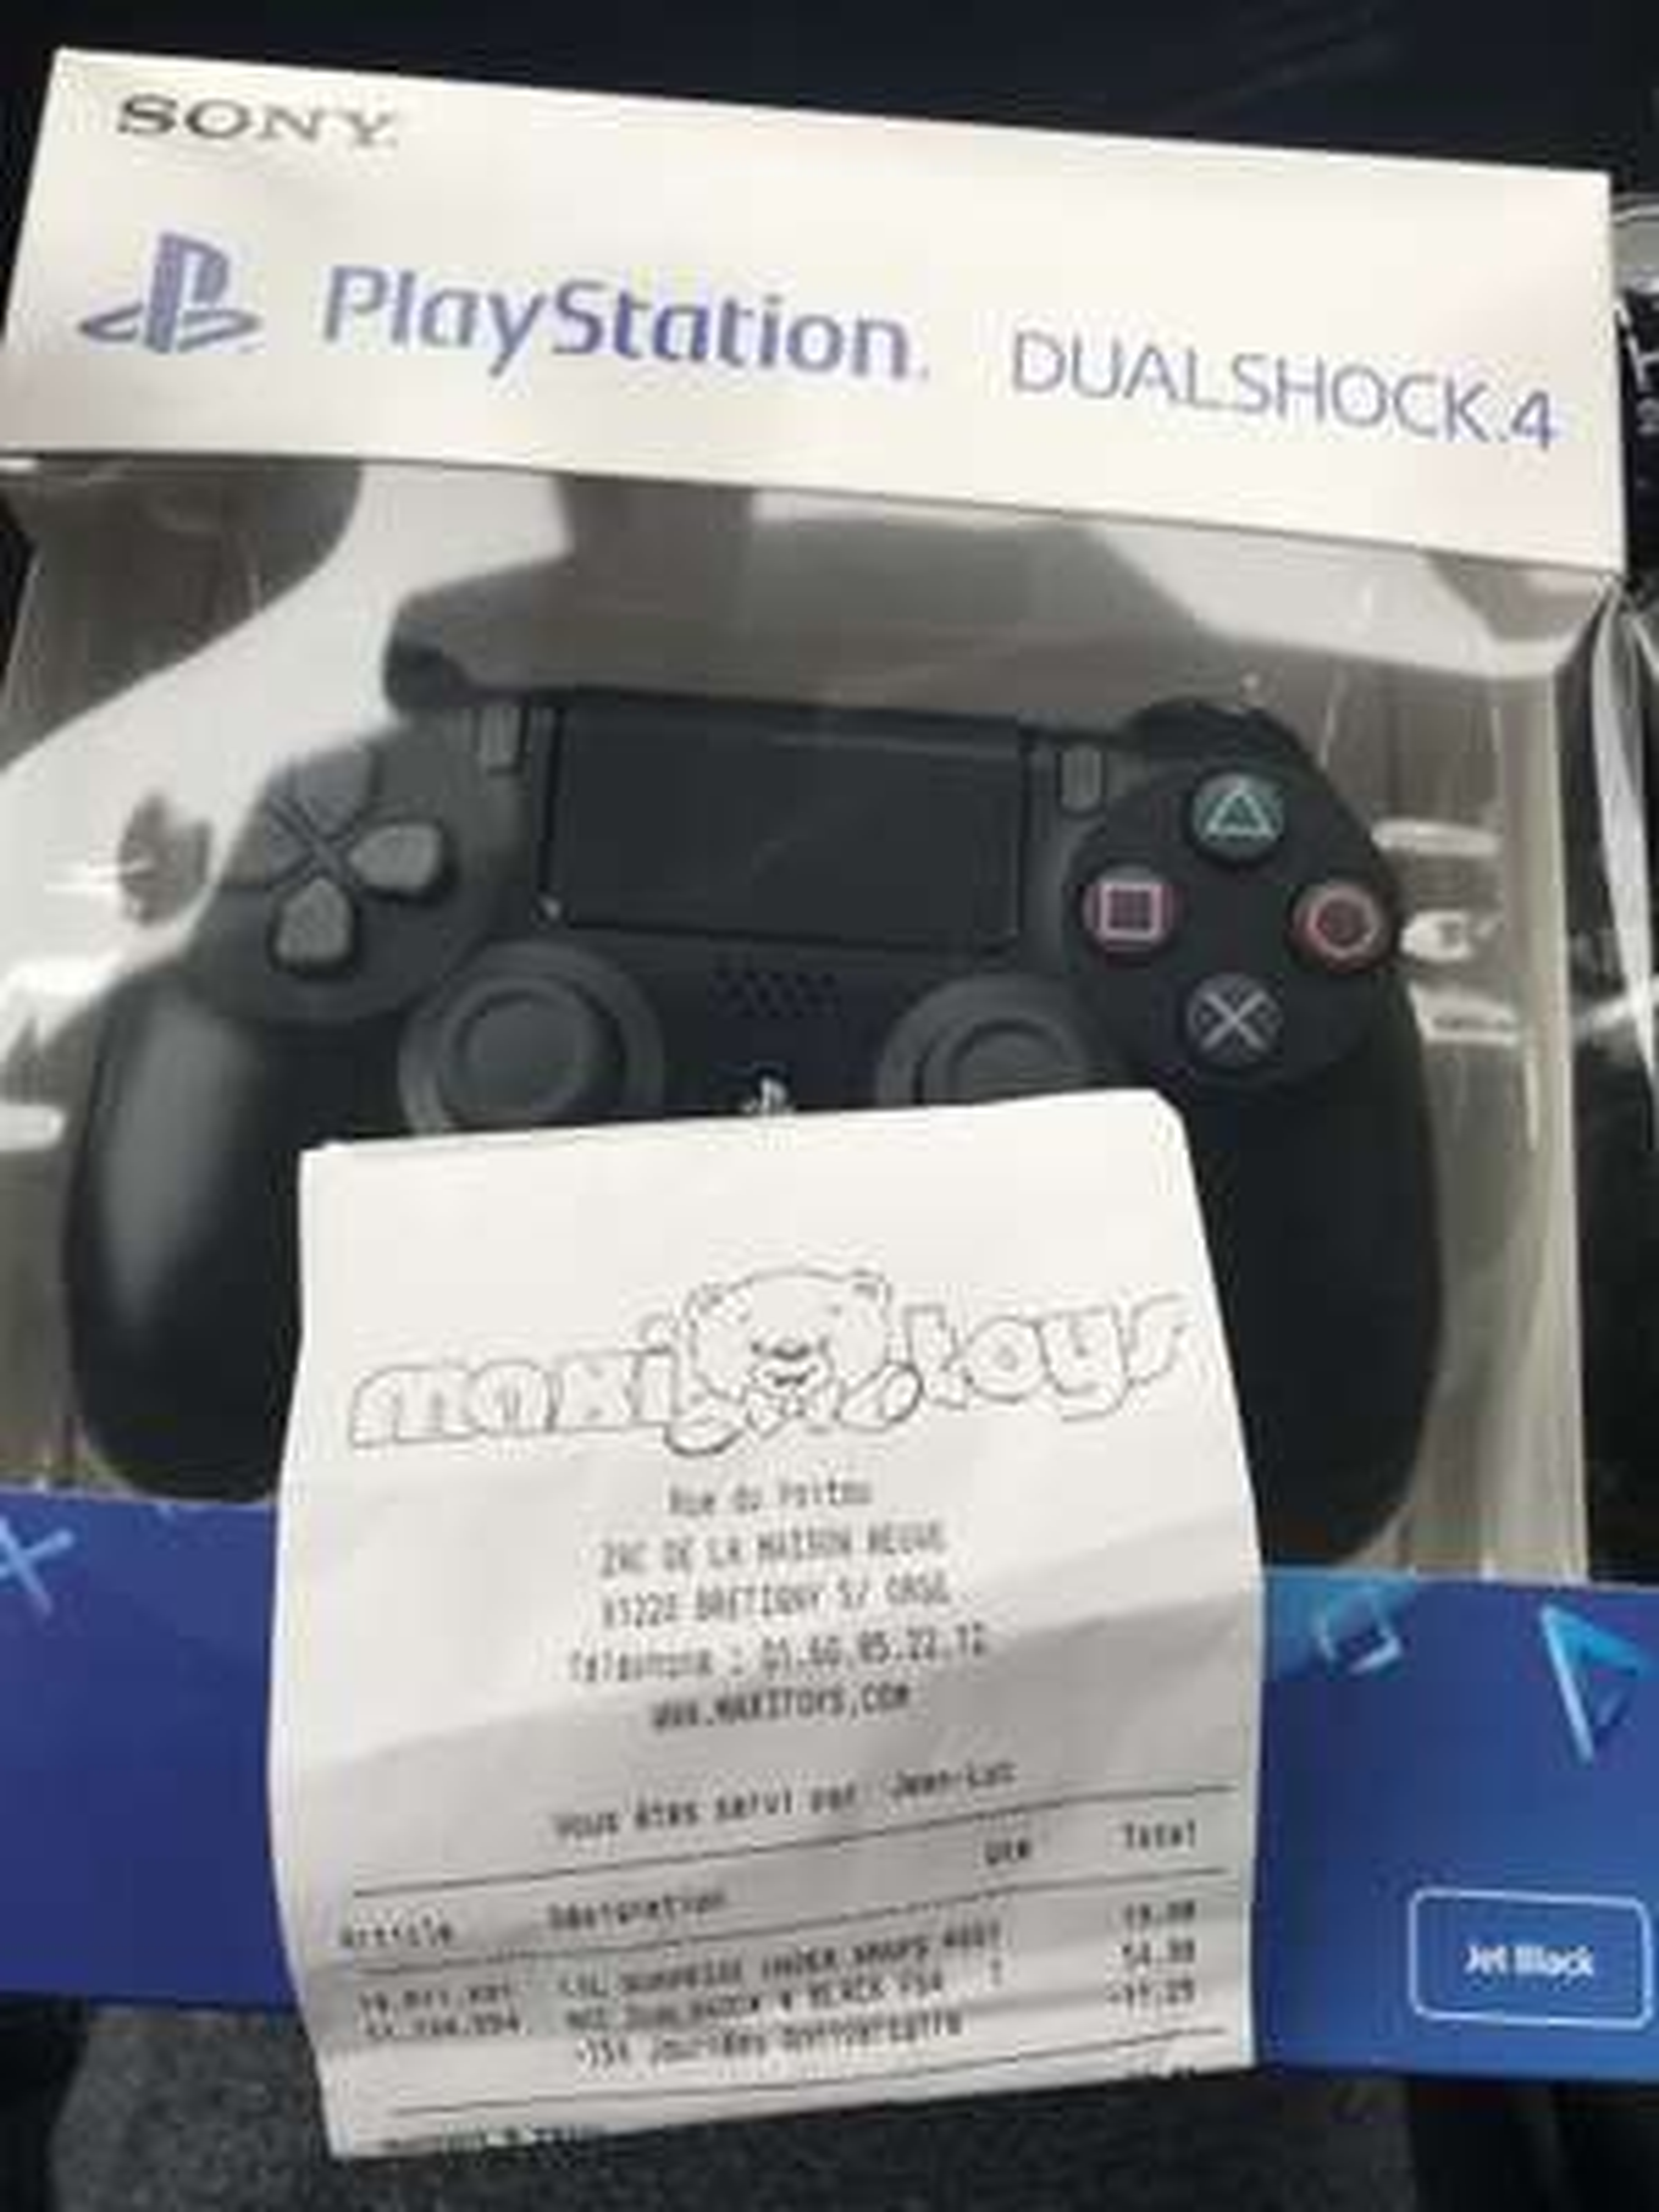 Manette Sony PS4 Dualshock - Noire V2 - Brétigny Sur Orge (91)